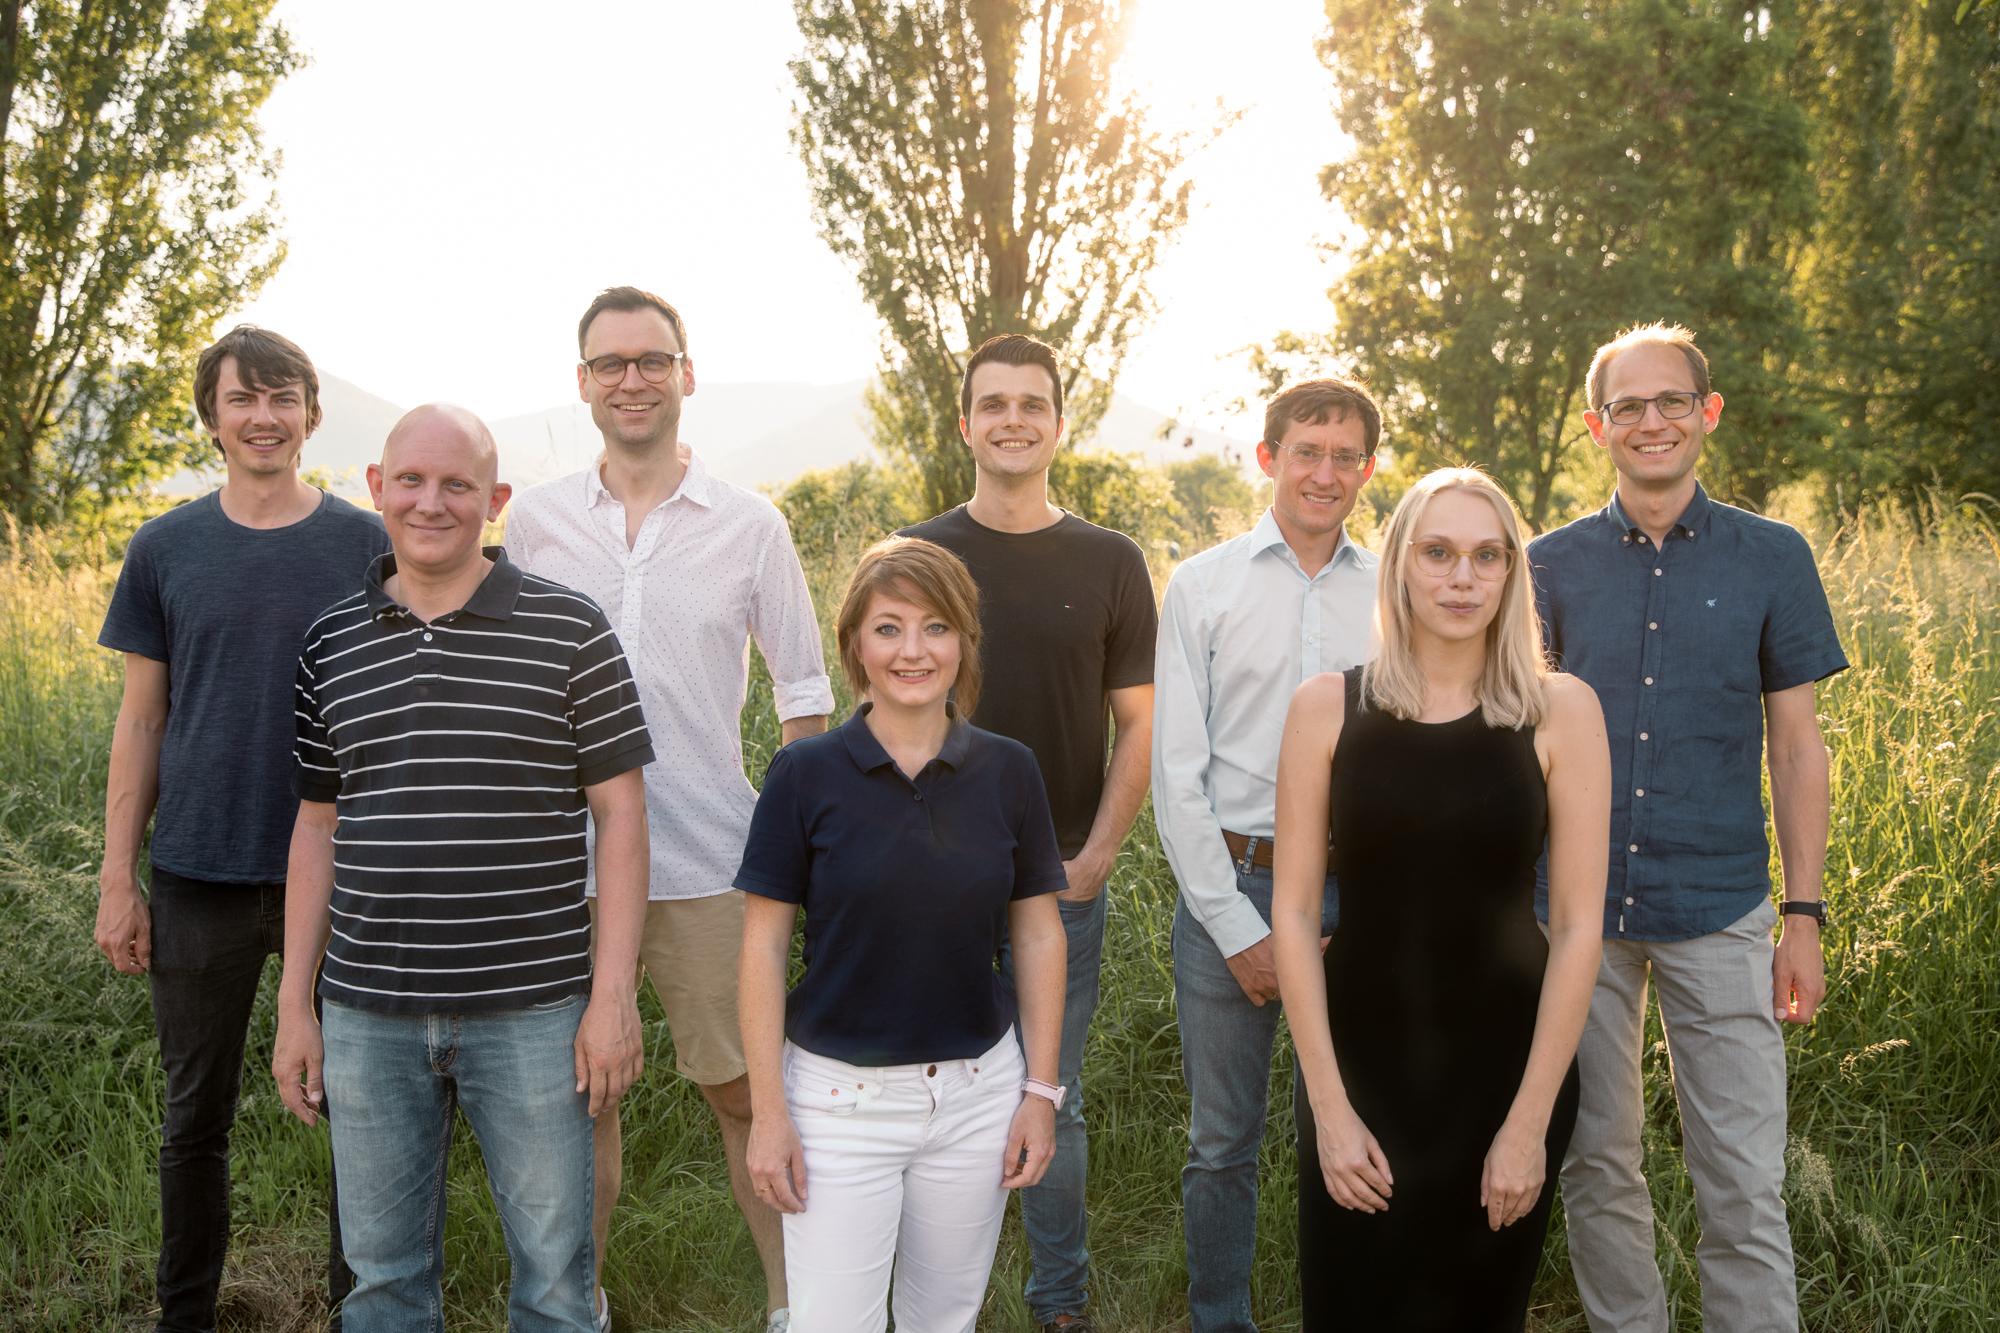 Teamfoto Eva Korn Rheinland-Pfalz